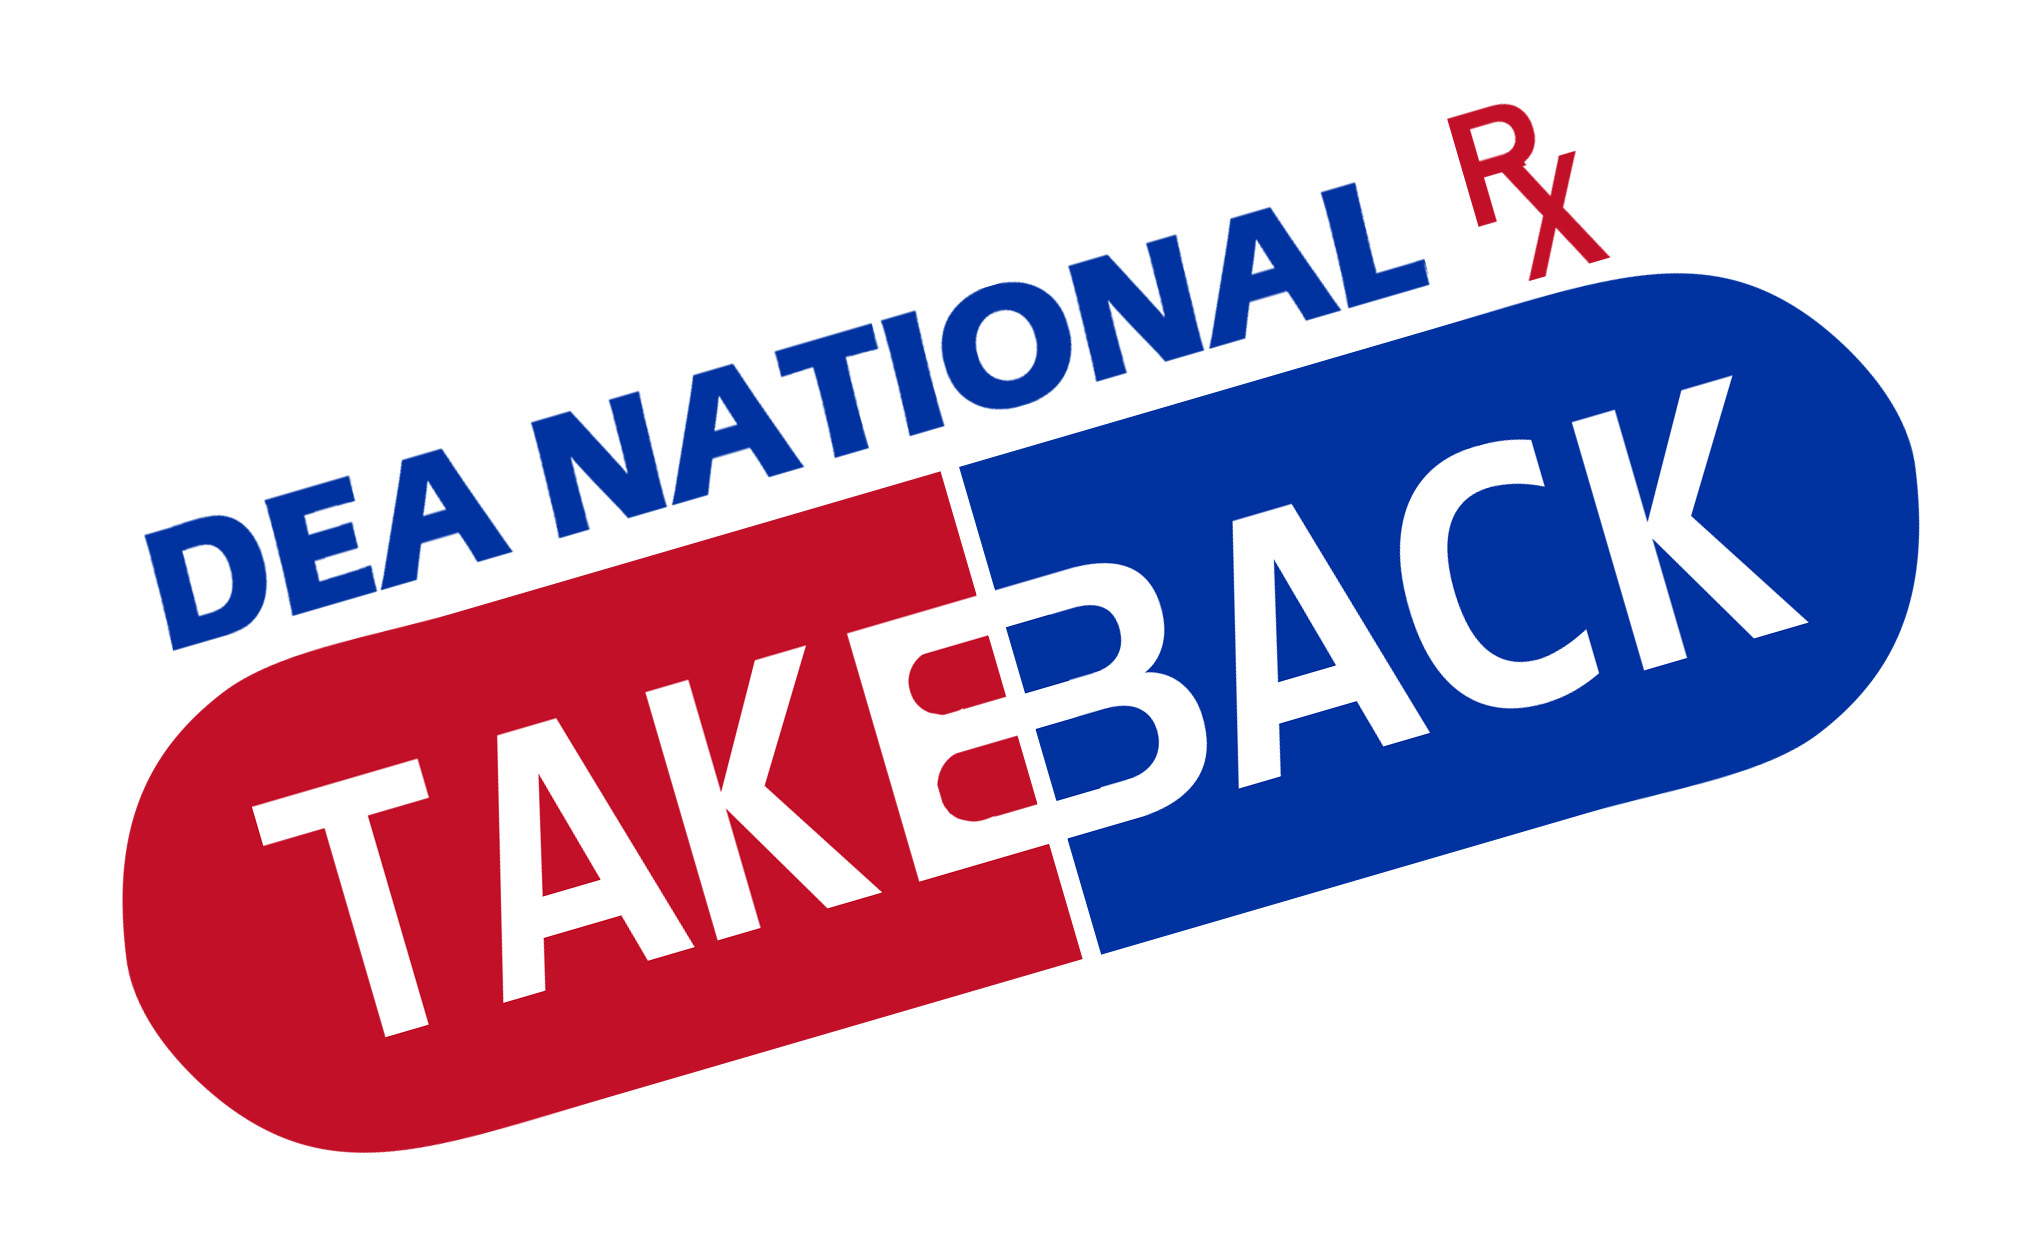 DEA Takeback logo